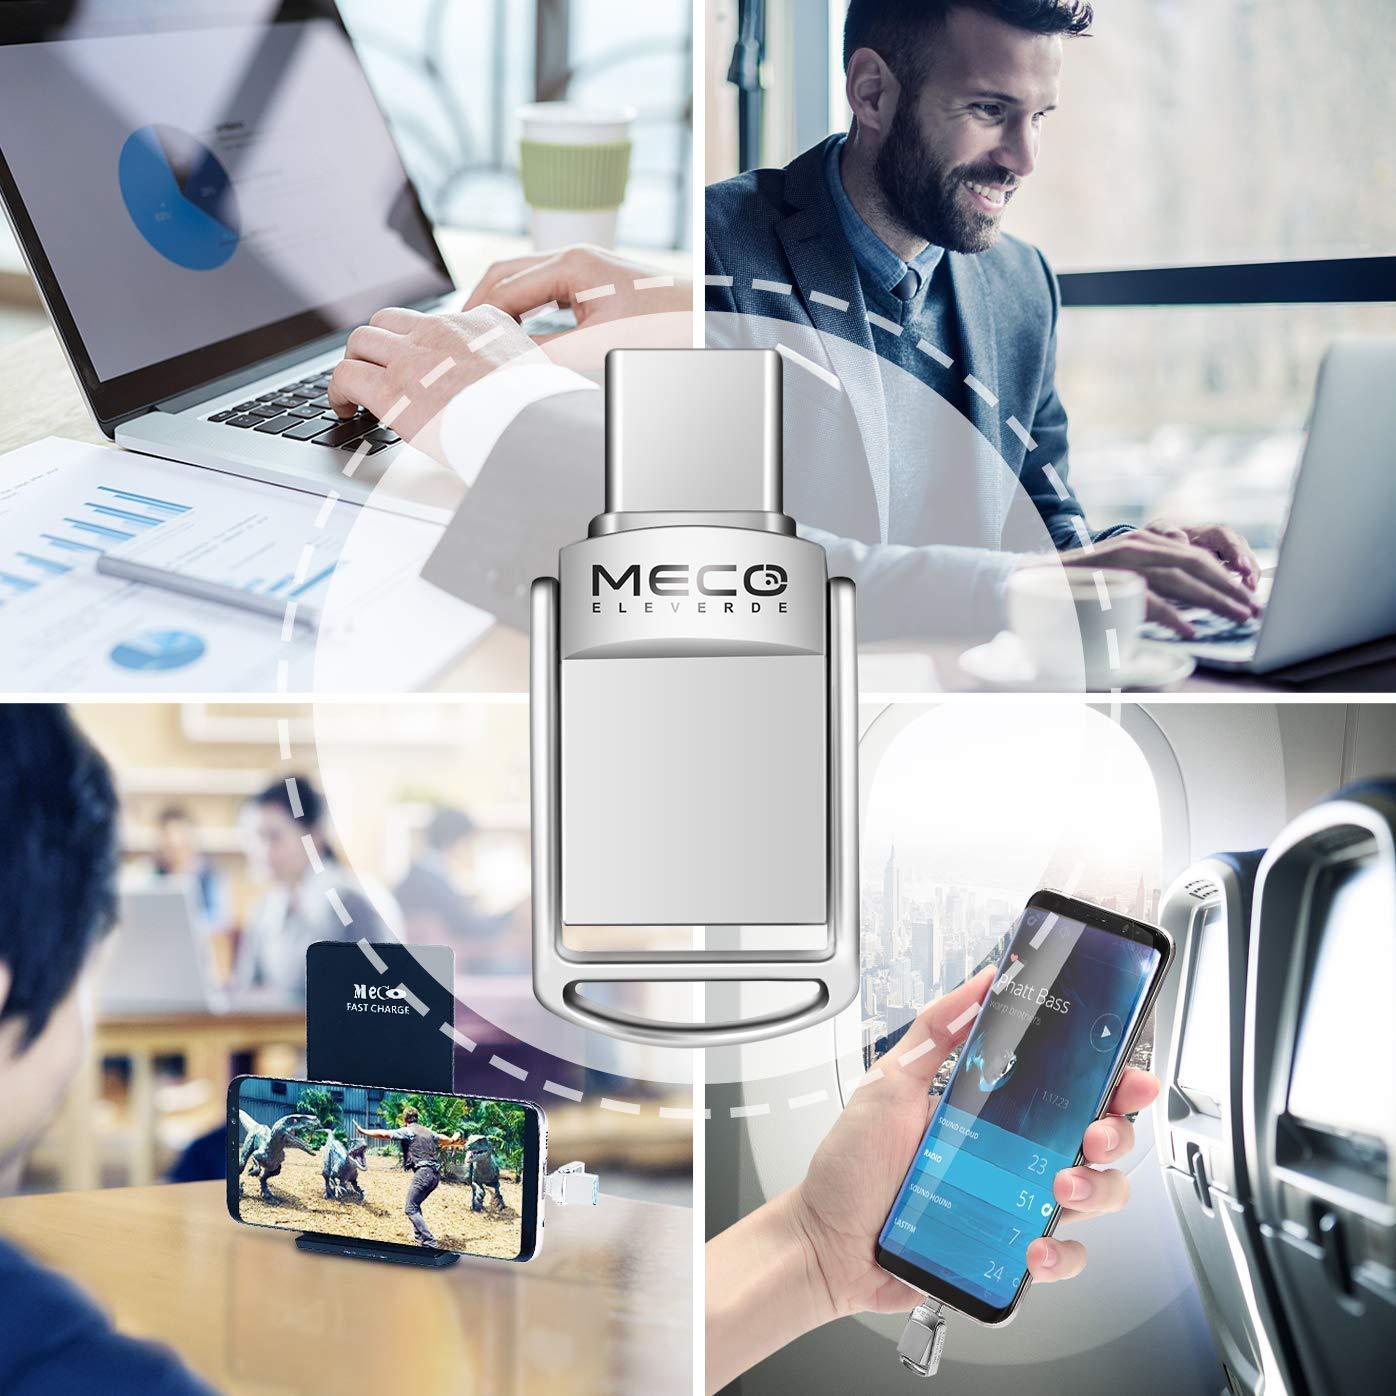 MECO ELEVERDE Pendrive 32gb 3.0 Memoria USB 32Giga 3.0 Luces de Colores Memory Stick Flash Drive para PC//Laptop//Notebook